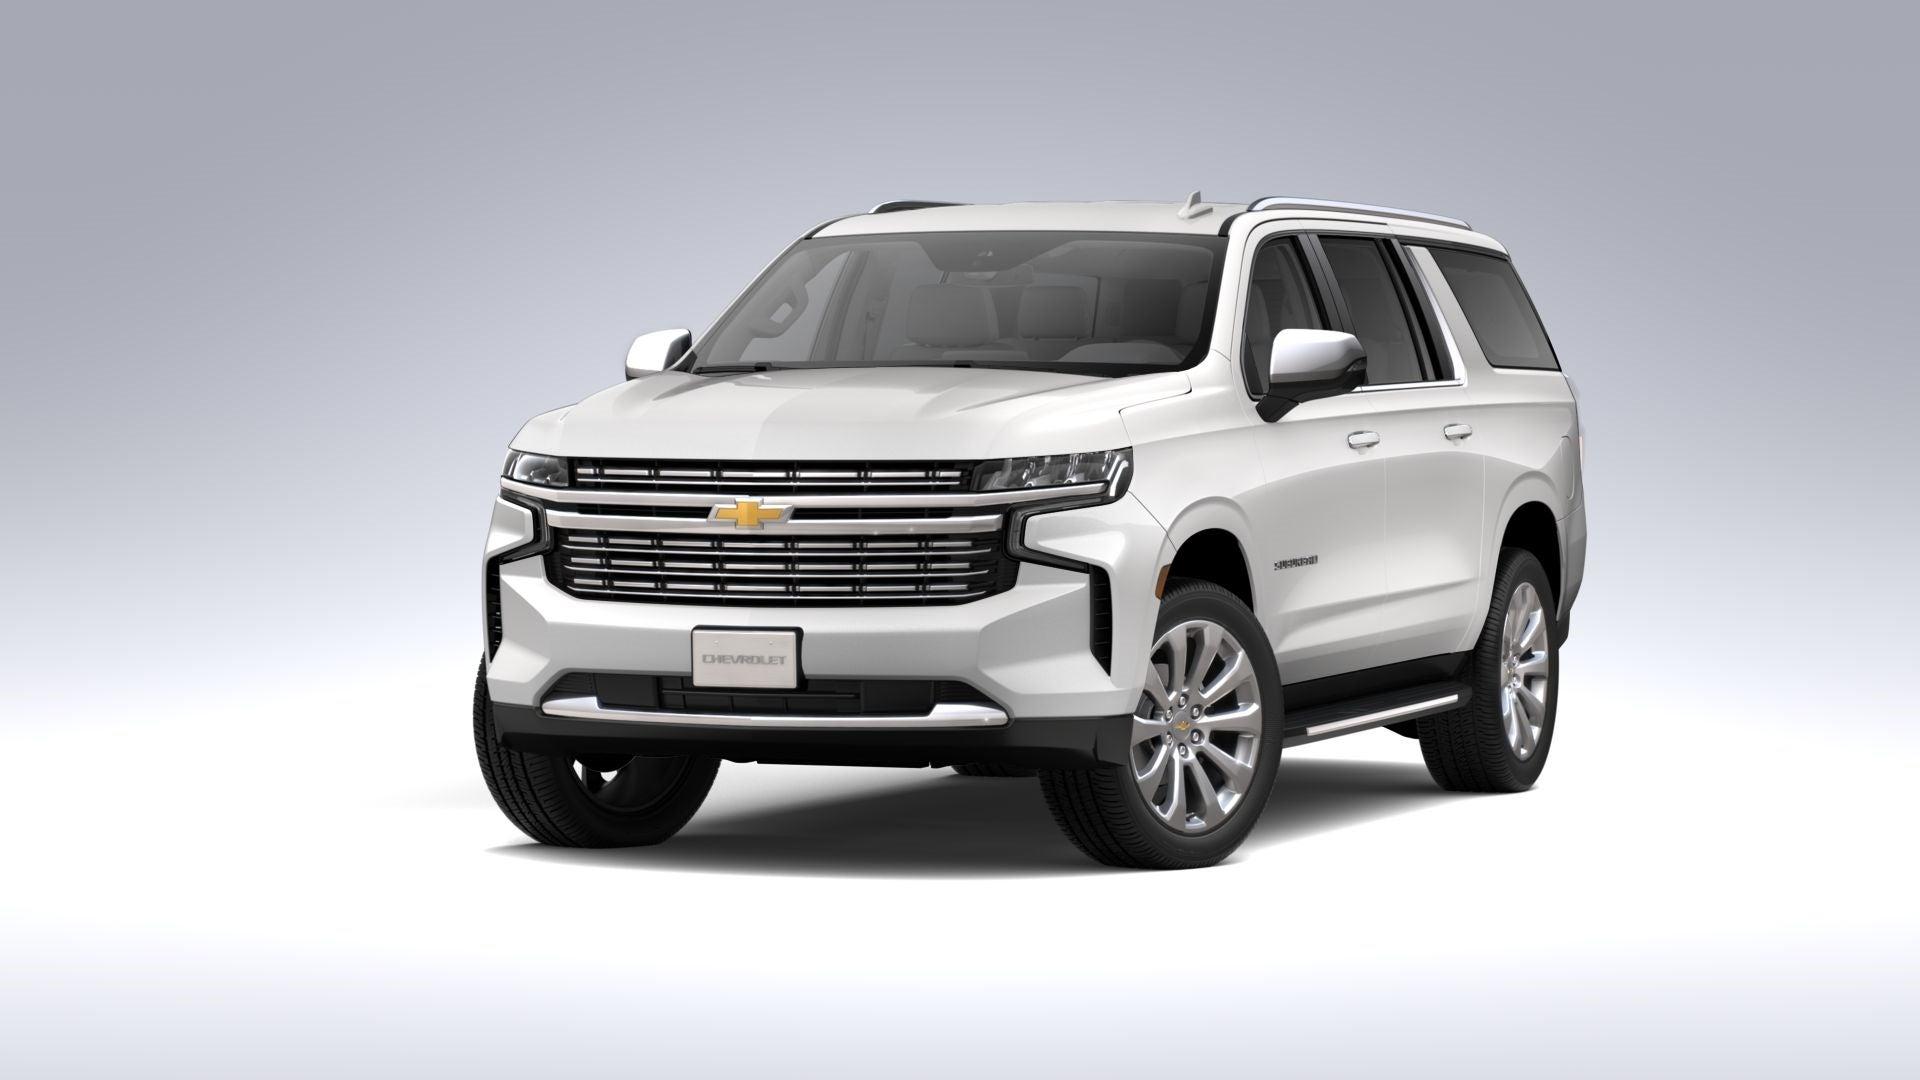 2021 Chevrolet Suburban Bloomer WI